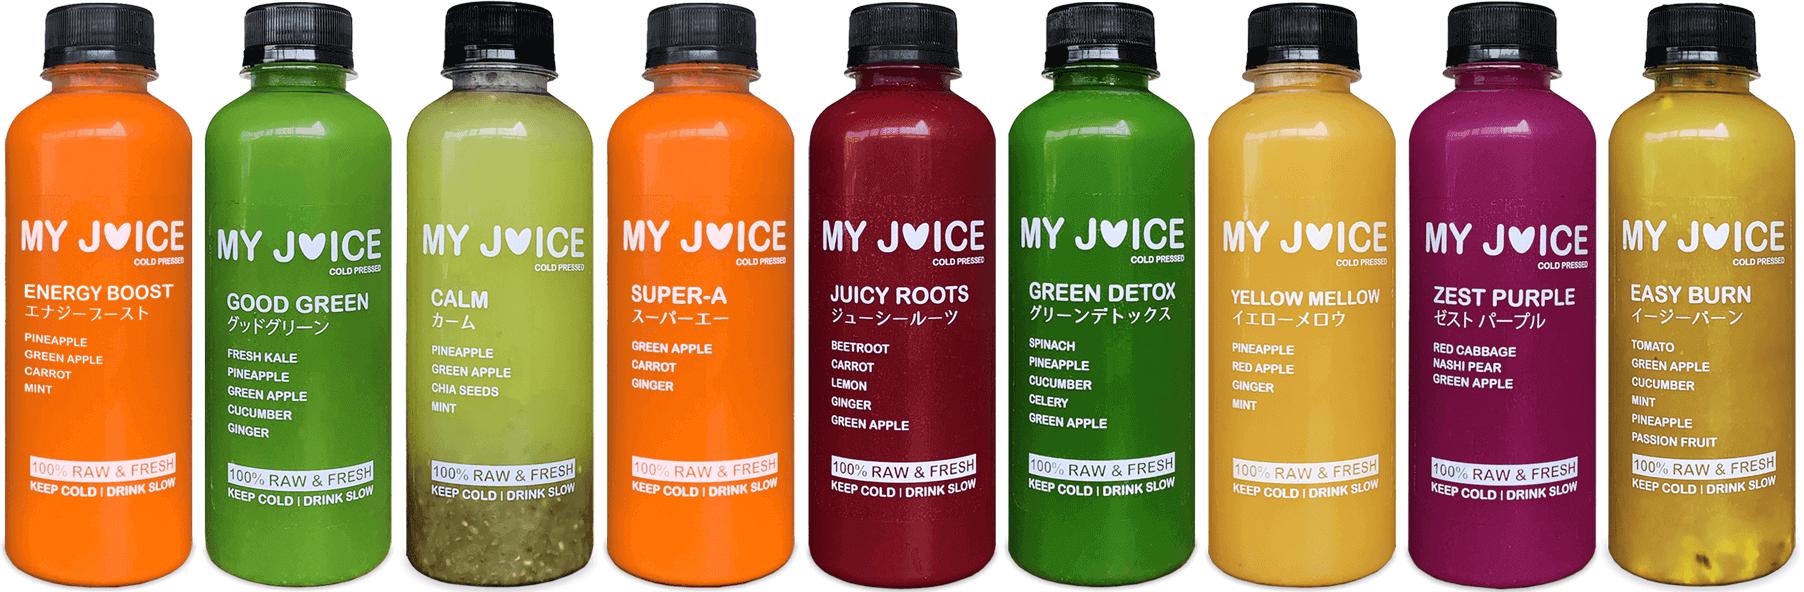 Juice Cleanse Program